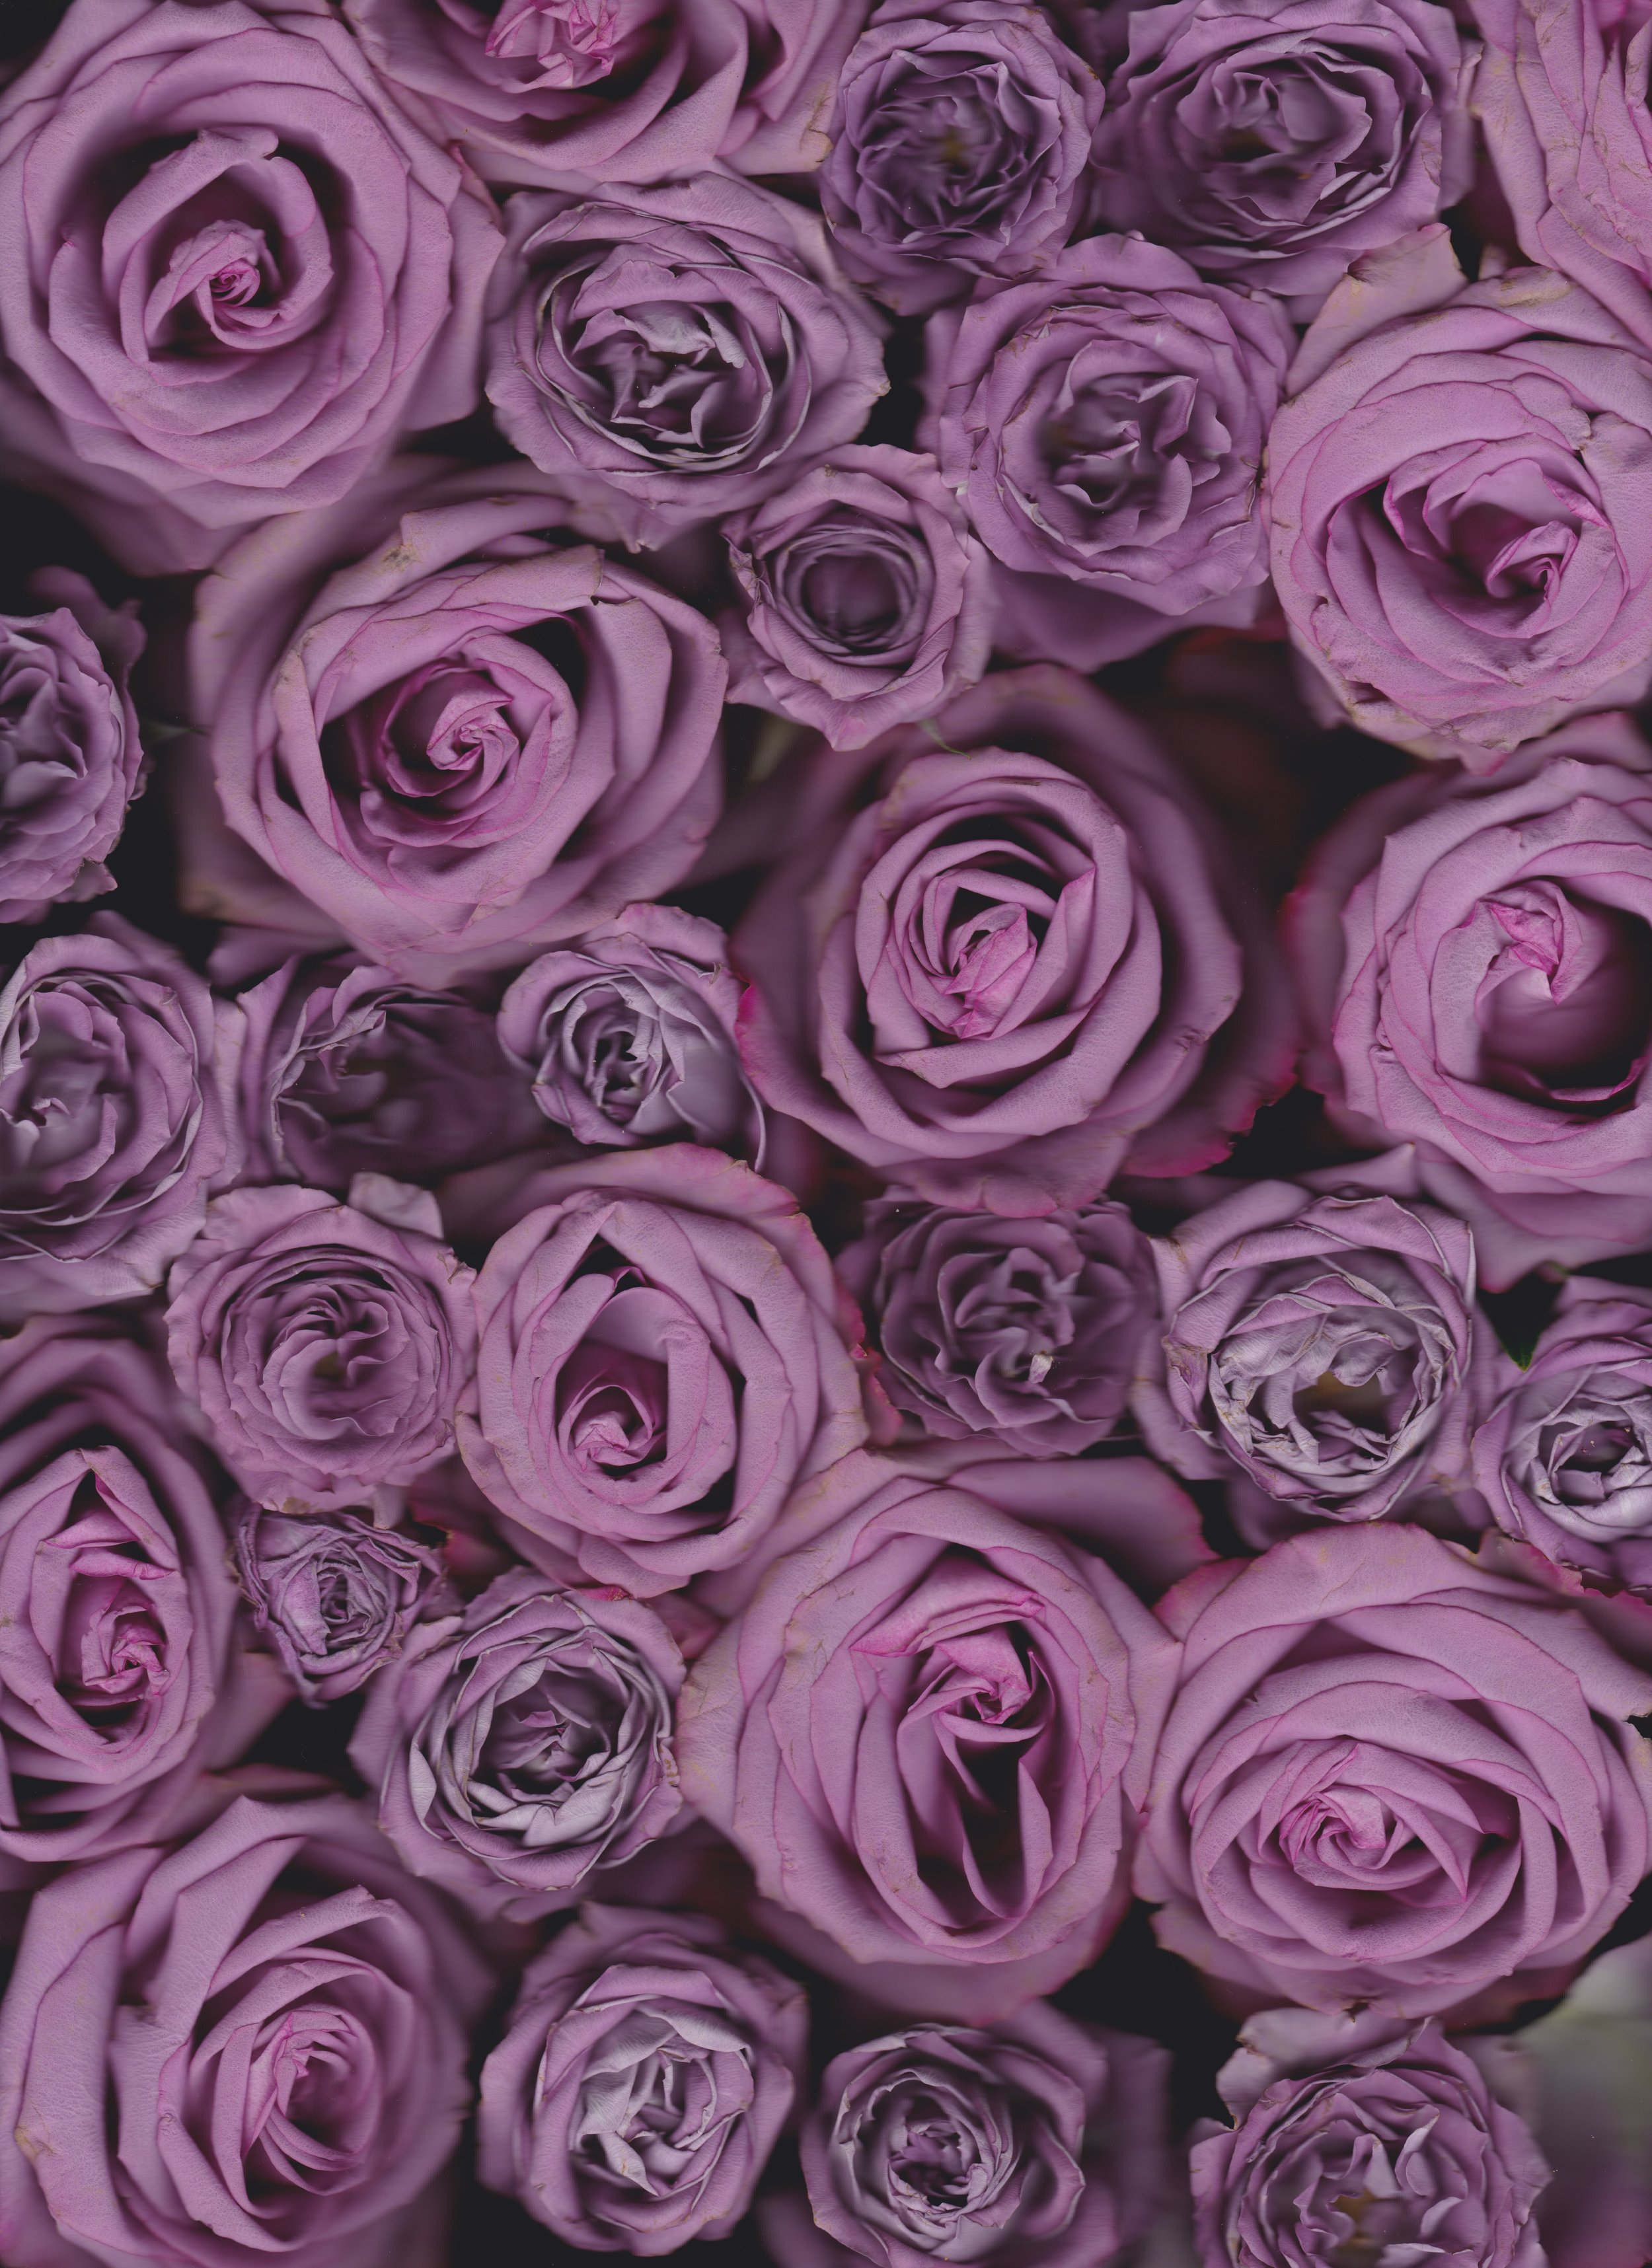 lavenderrosescan11_21_18 2.jpeg